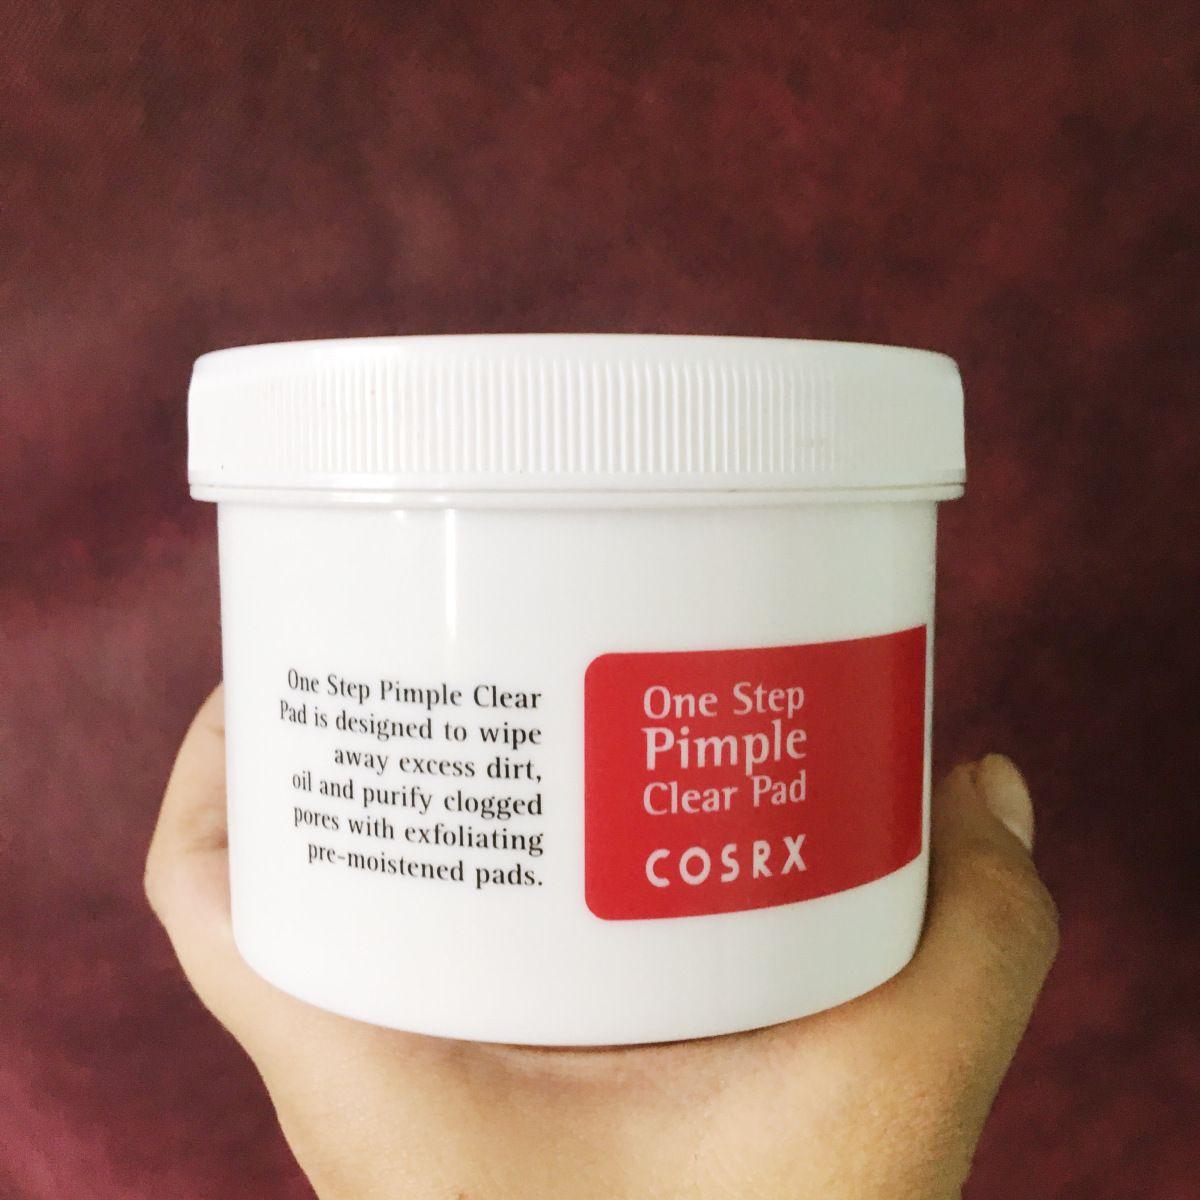 Bluehost Com Cosrx Pimples Wipe Away